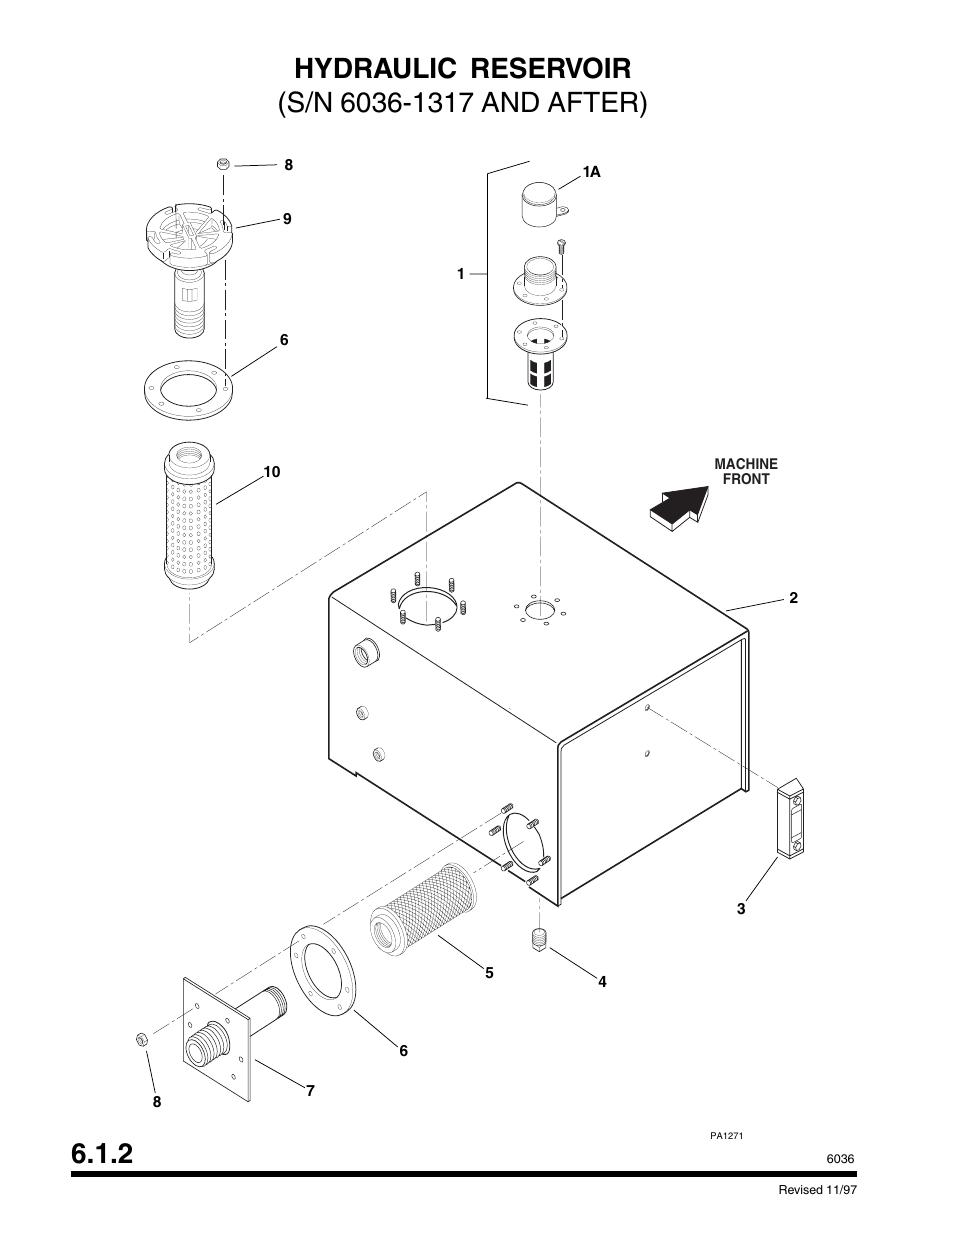 Manual 8021 63 125